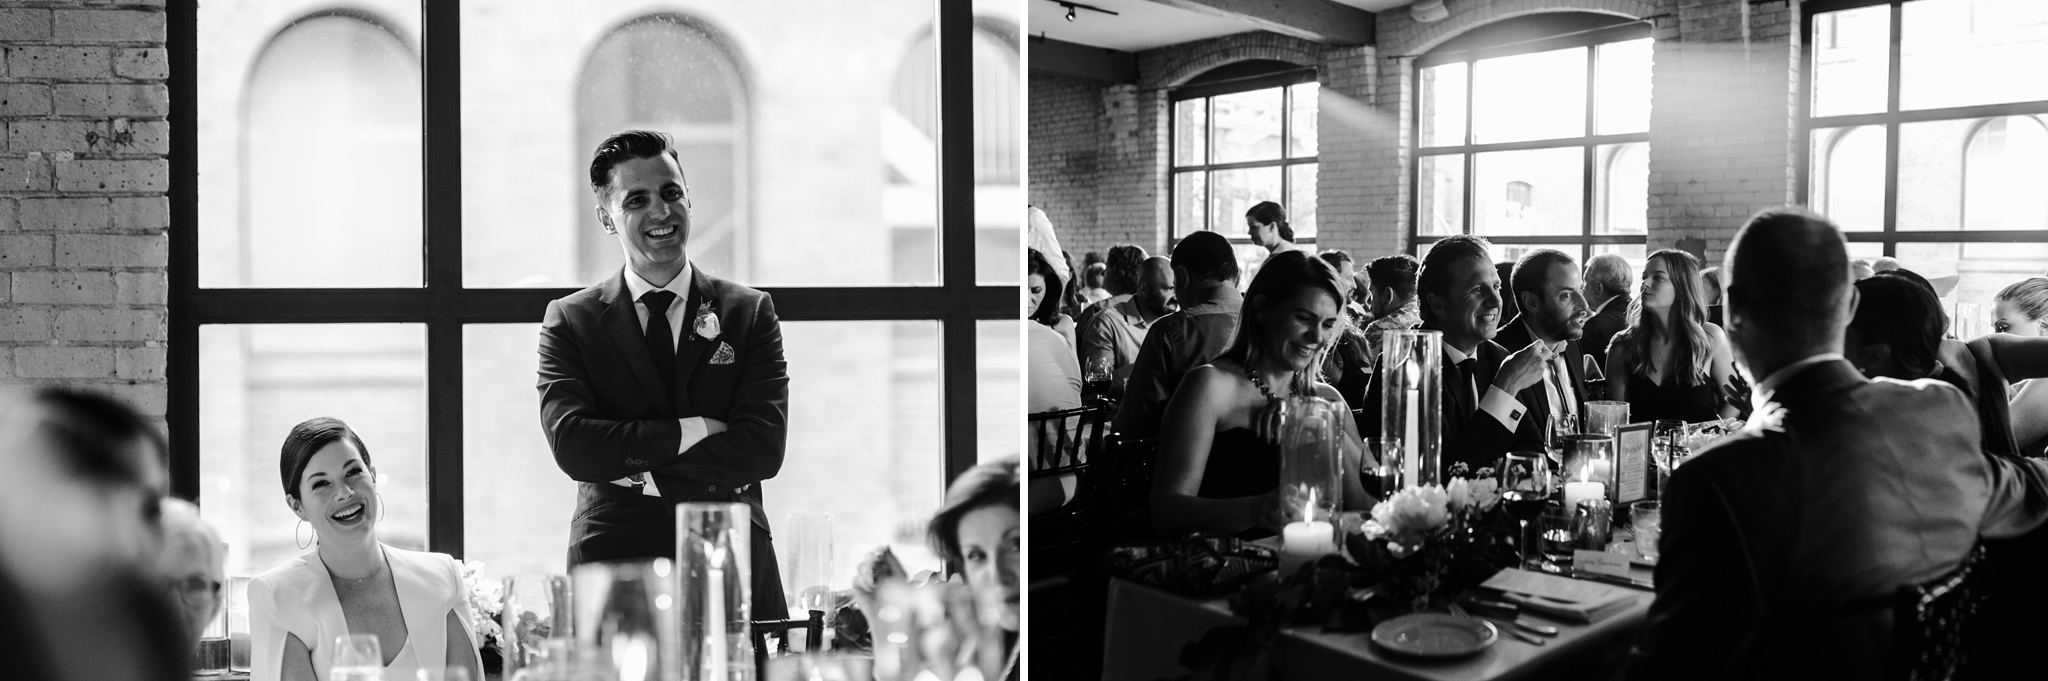 072-guests-candids-documentary-wedding-photographer-reception-storys-toronto.jpg